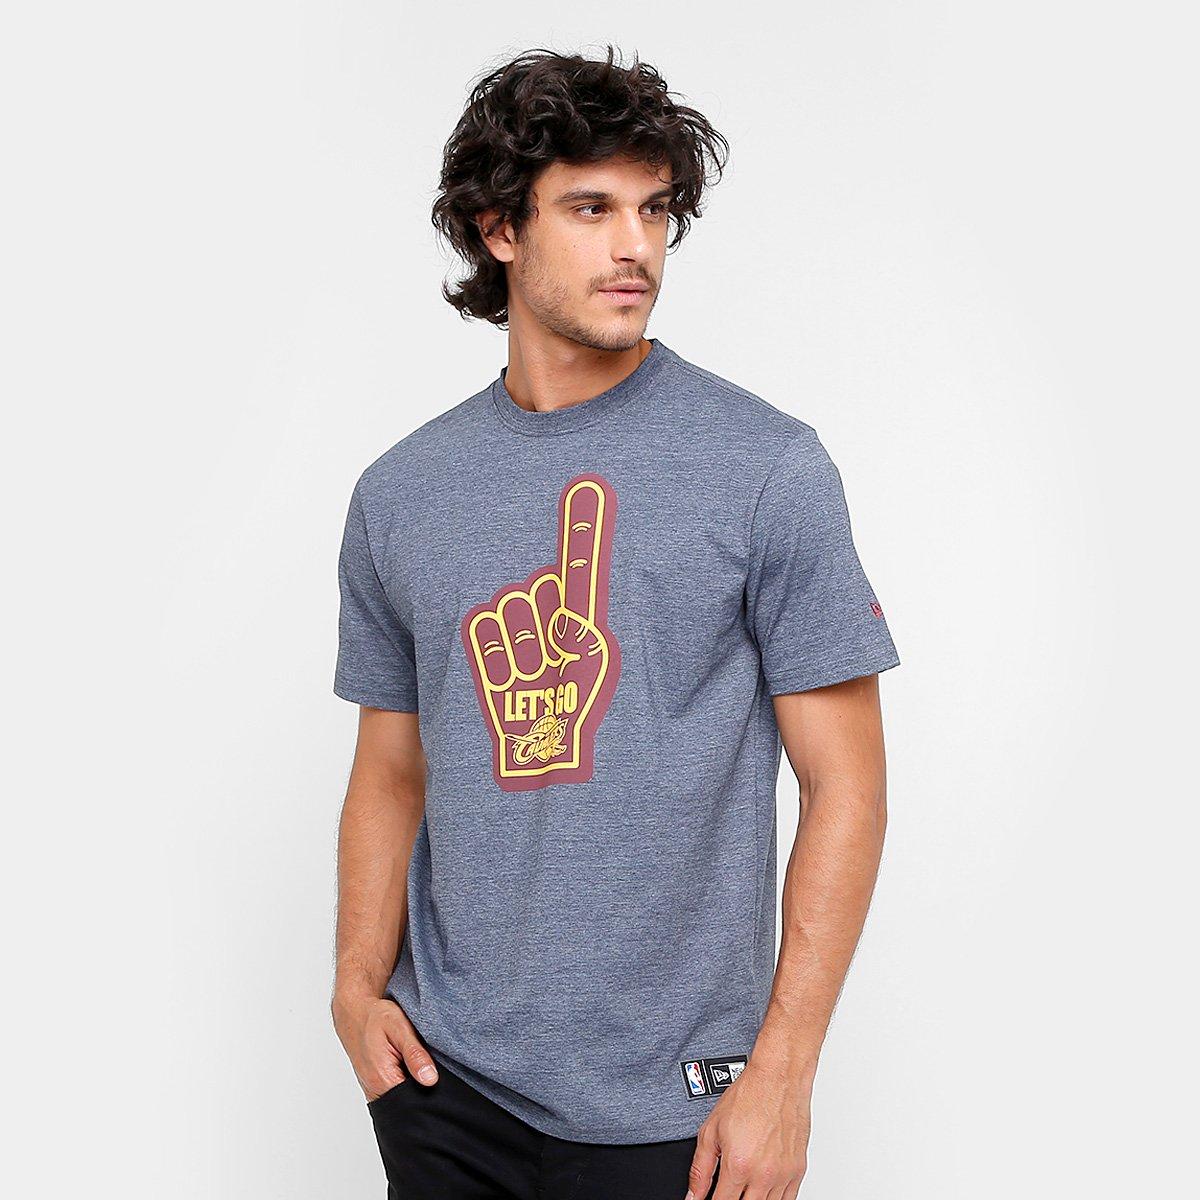 fd6d784f9 Camiseta NBA Cleveland Cavaliers New Era 07 Let s Go - Compre Agora ...